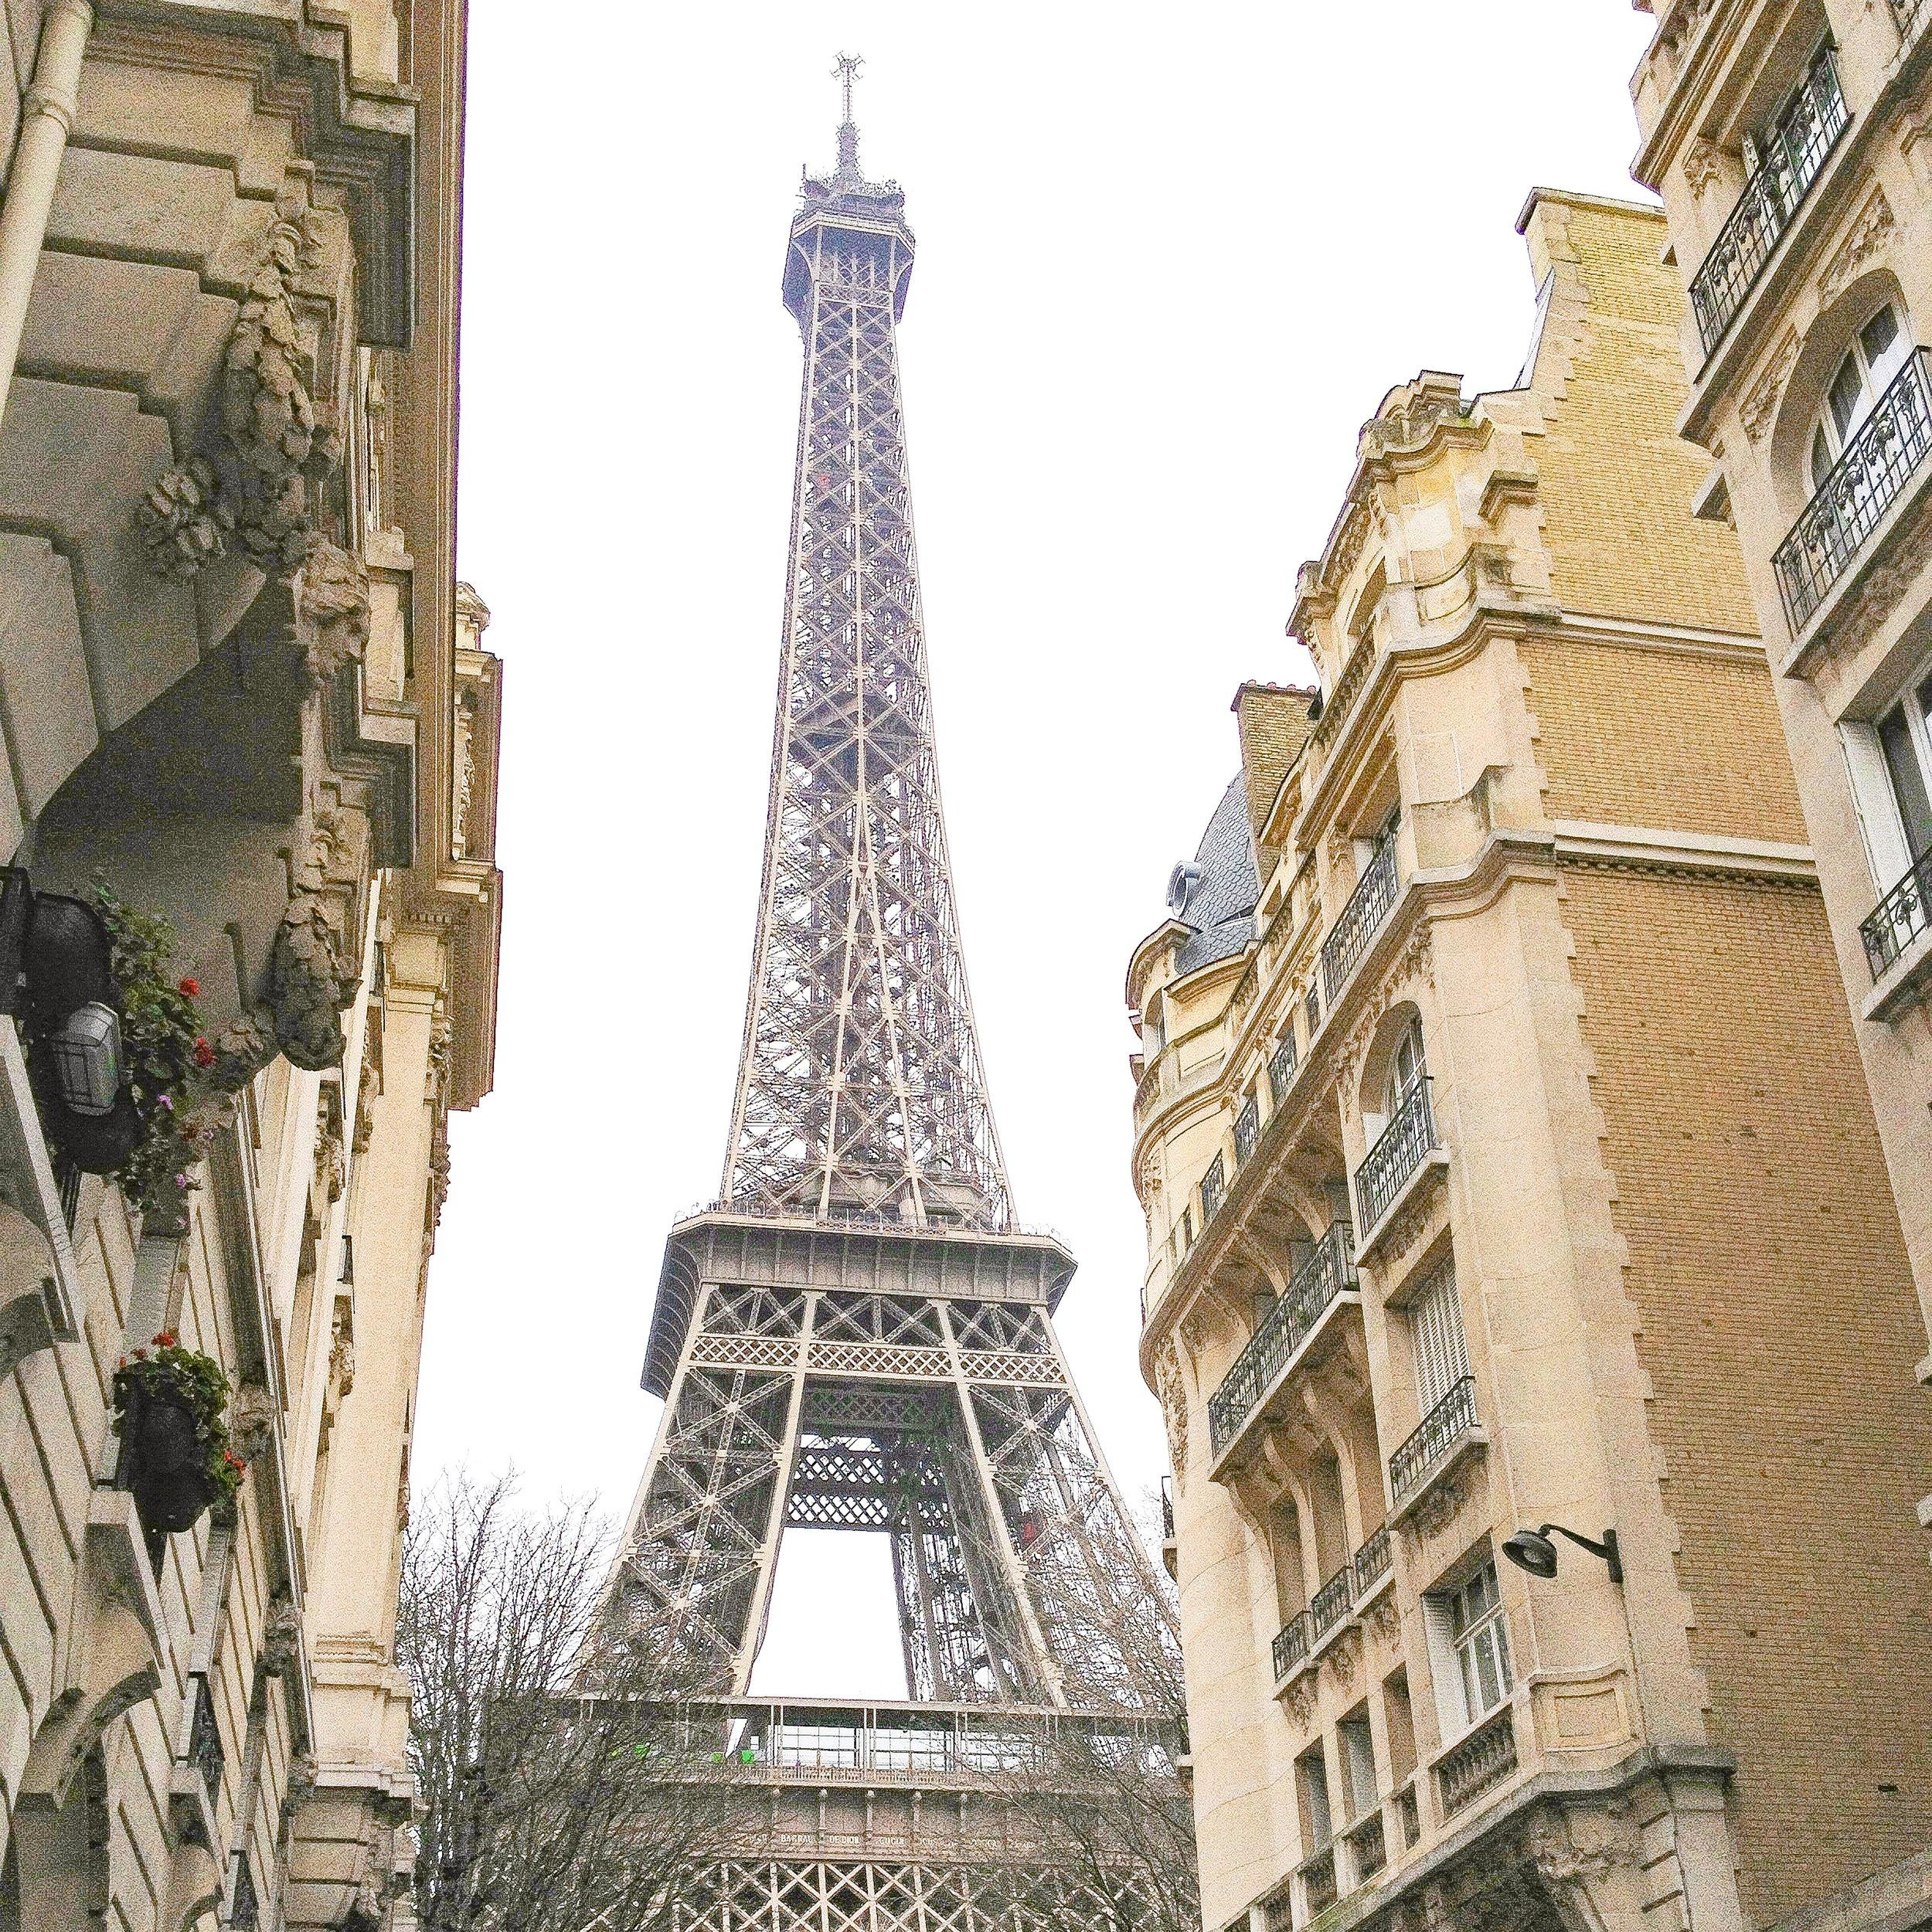 Paris (shot on a iPhone 4)